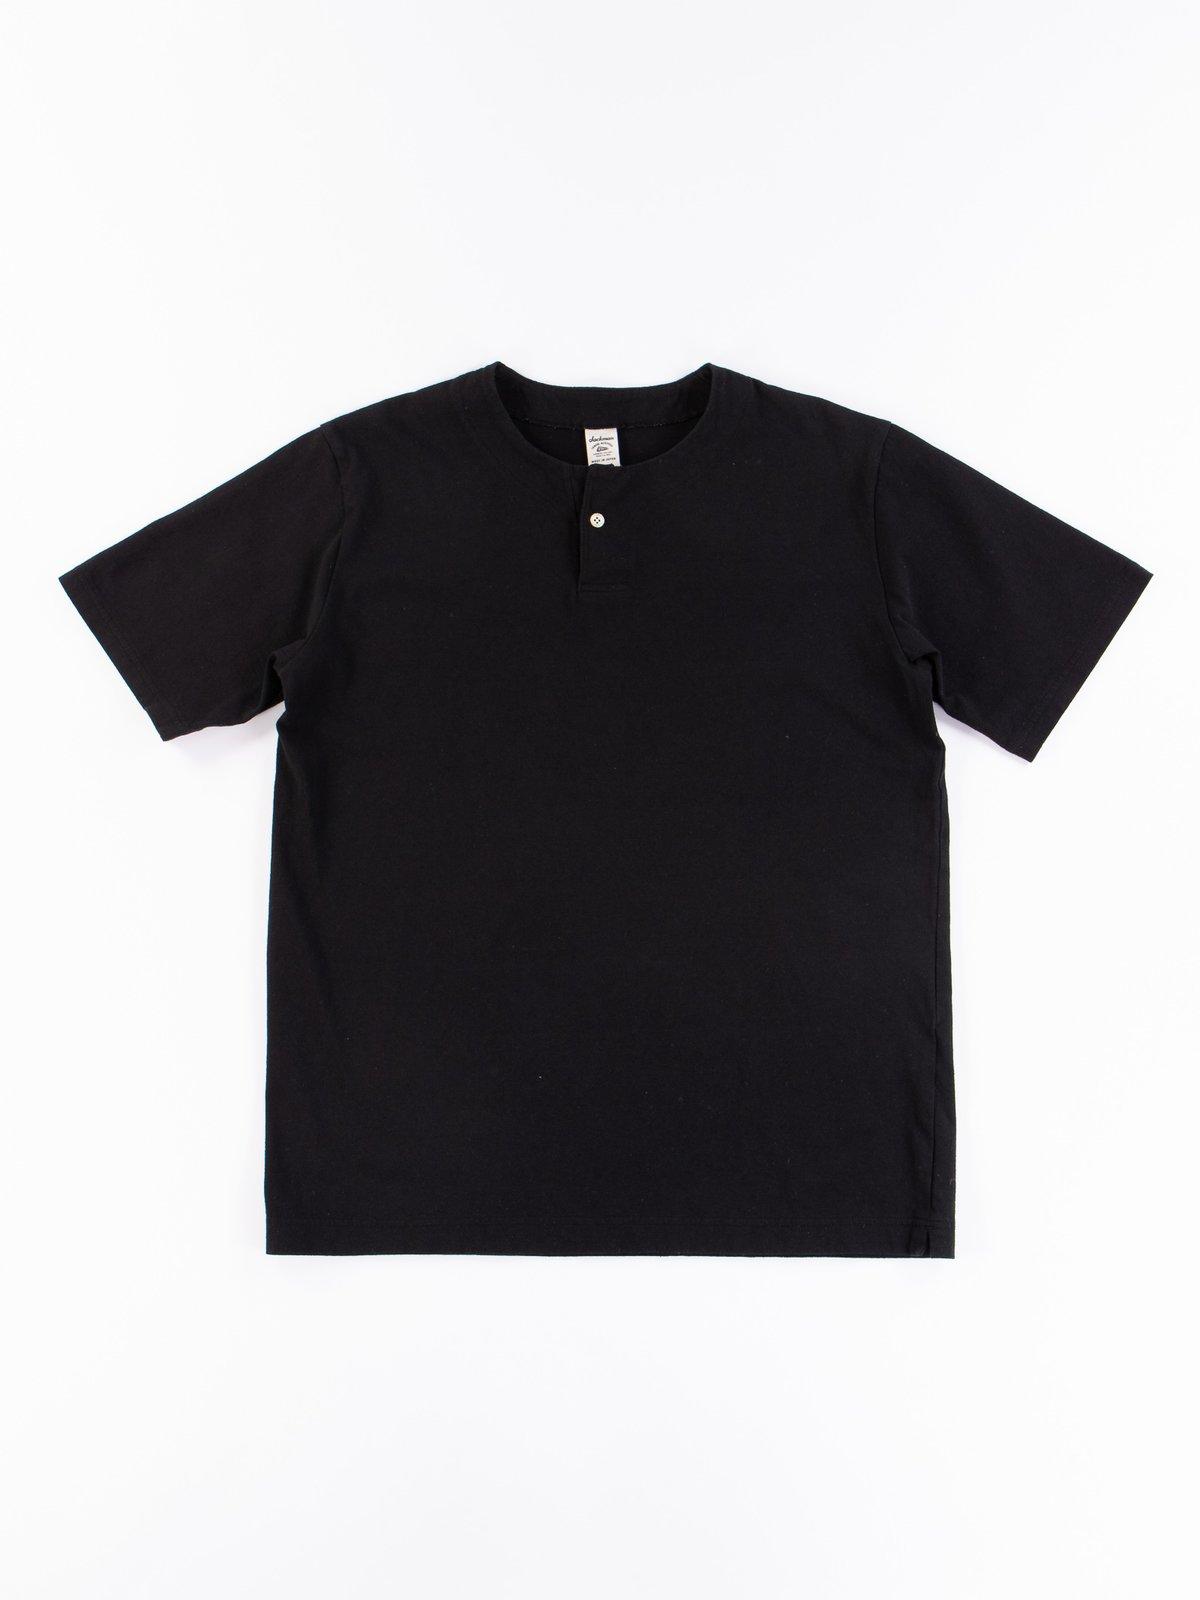 Black Henley T–Shirt - Image 1